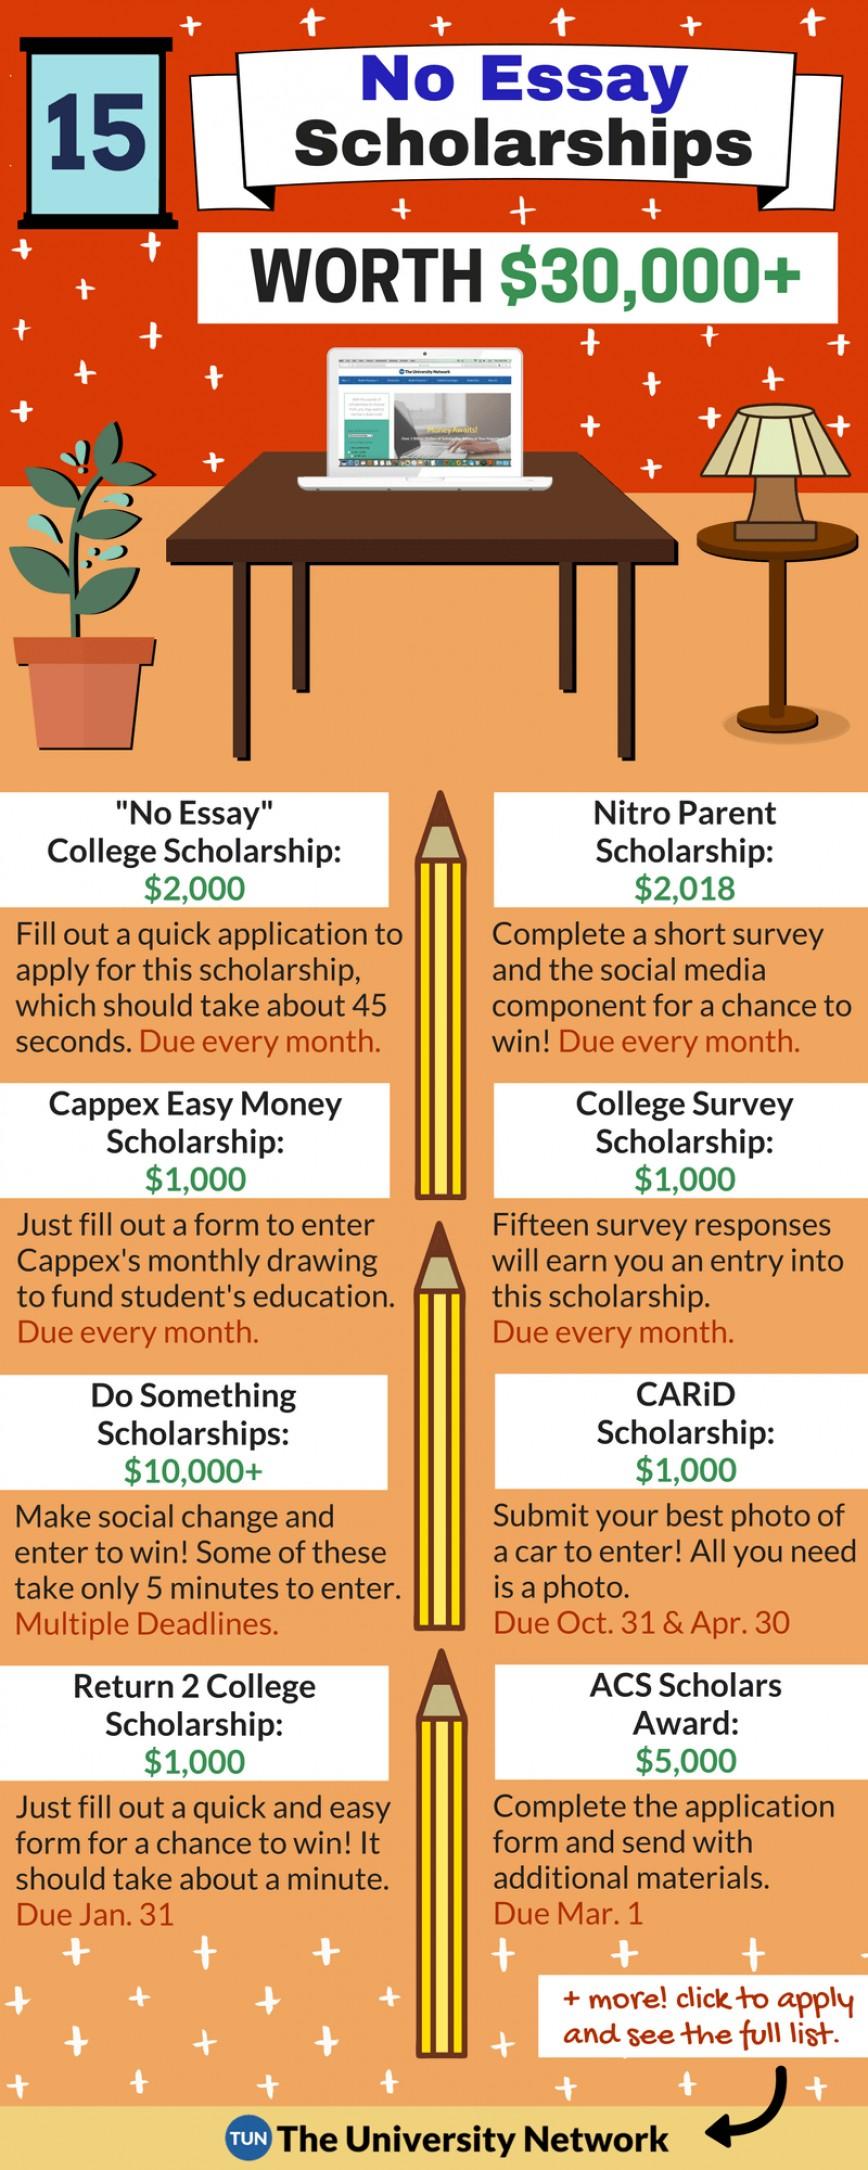 009 No Essay Scholarships For Seniors Example Singular 2018 High School